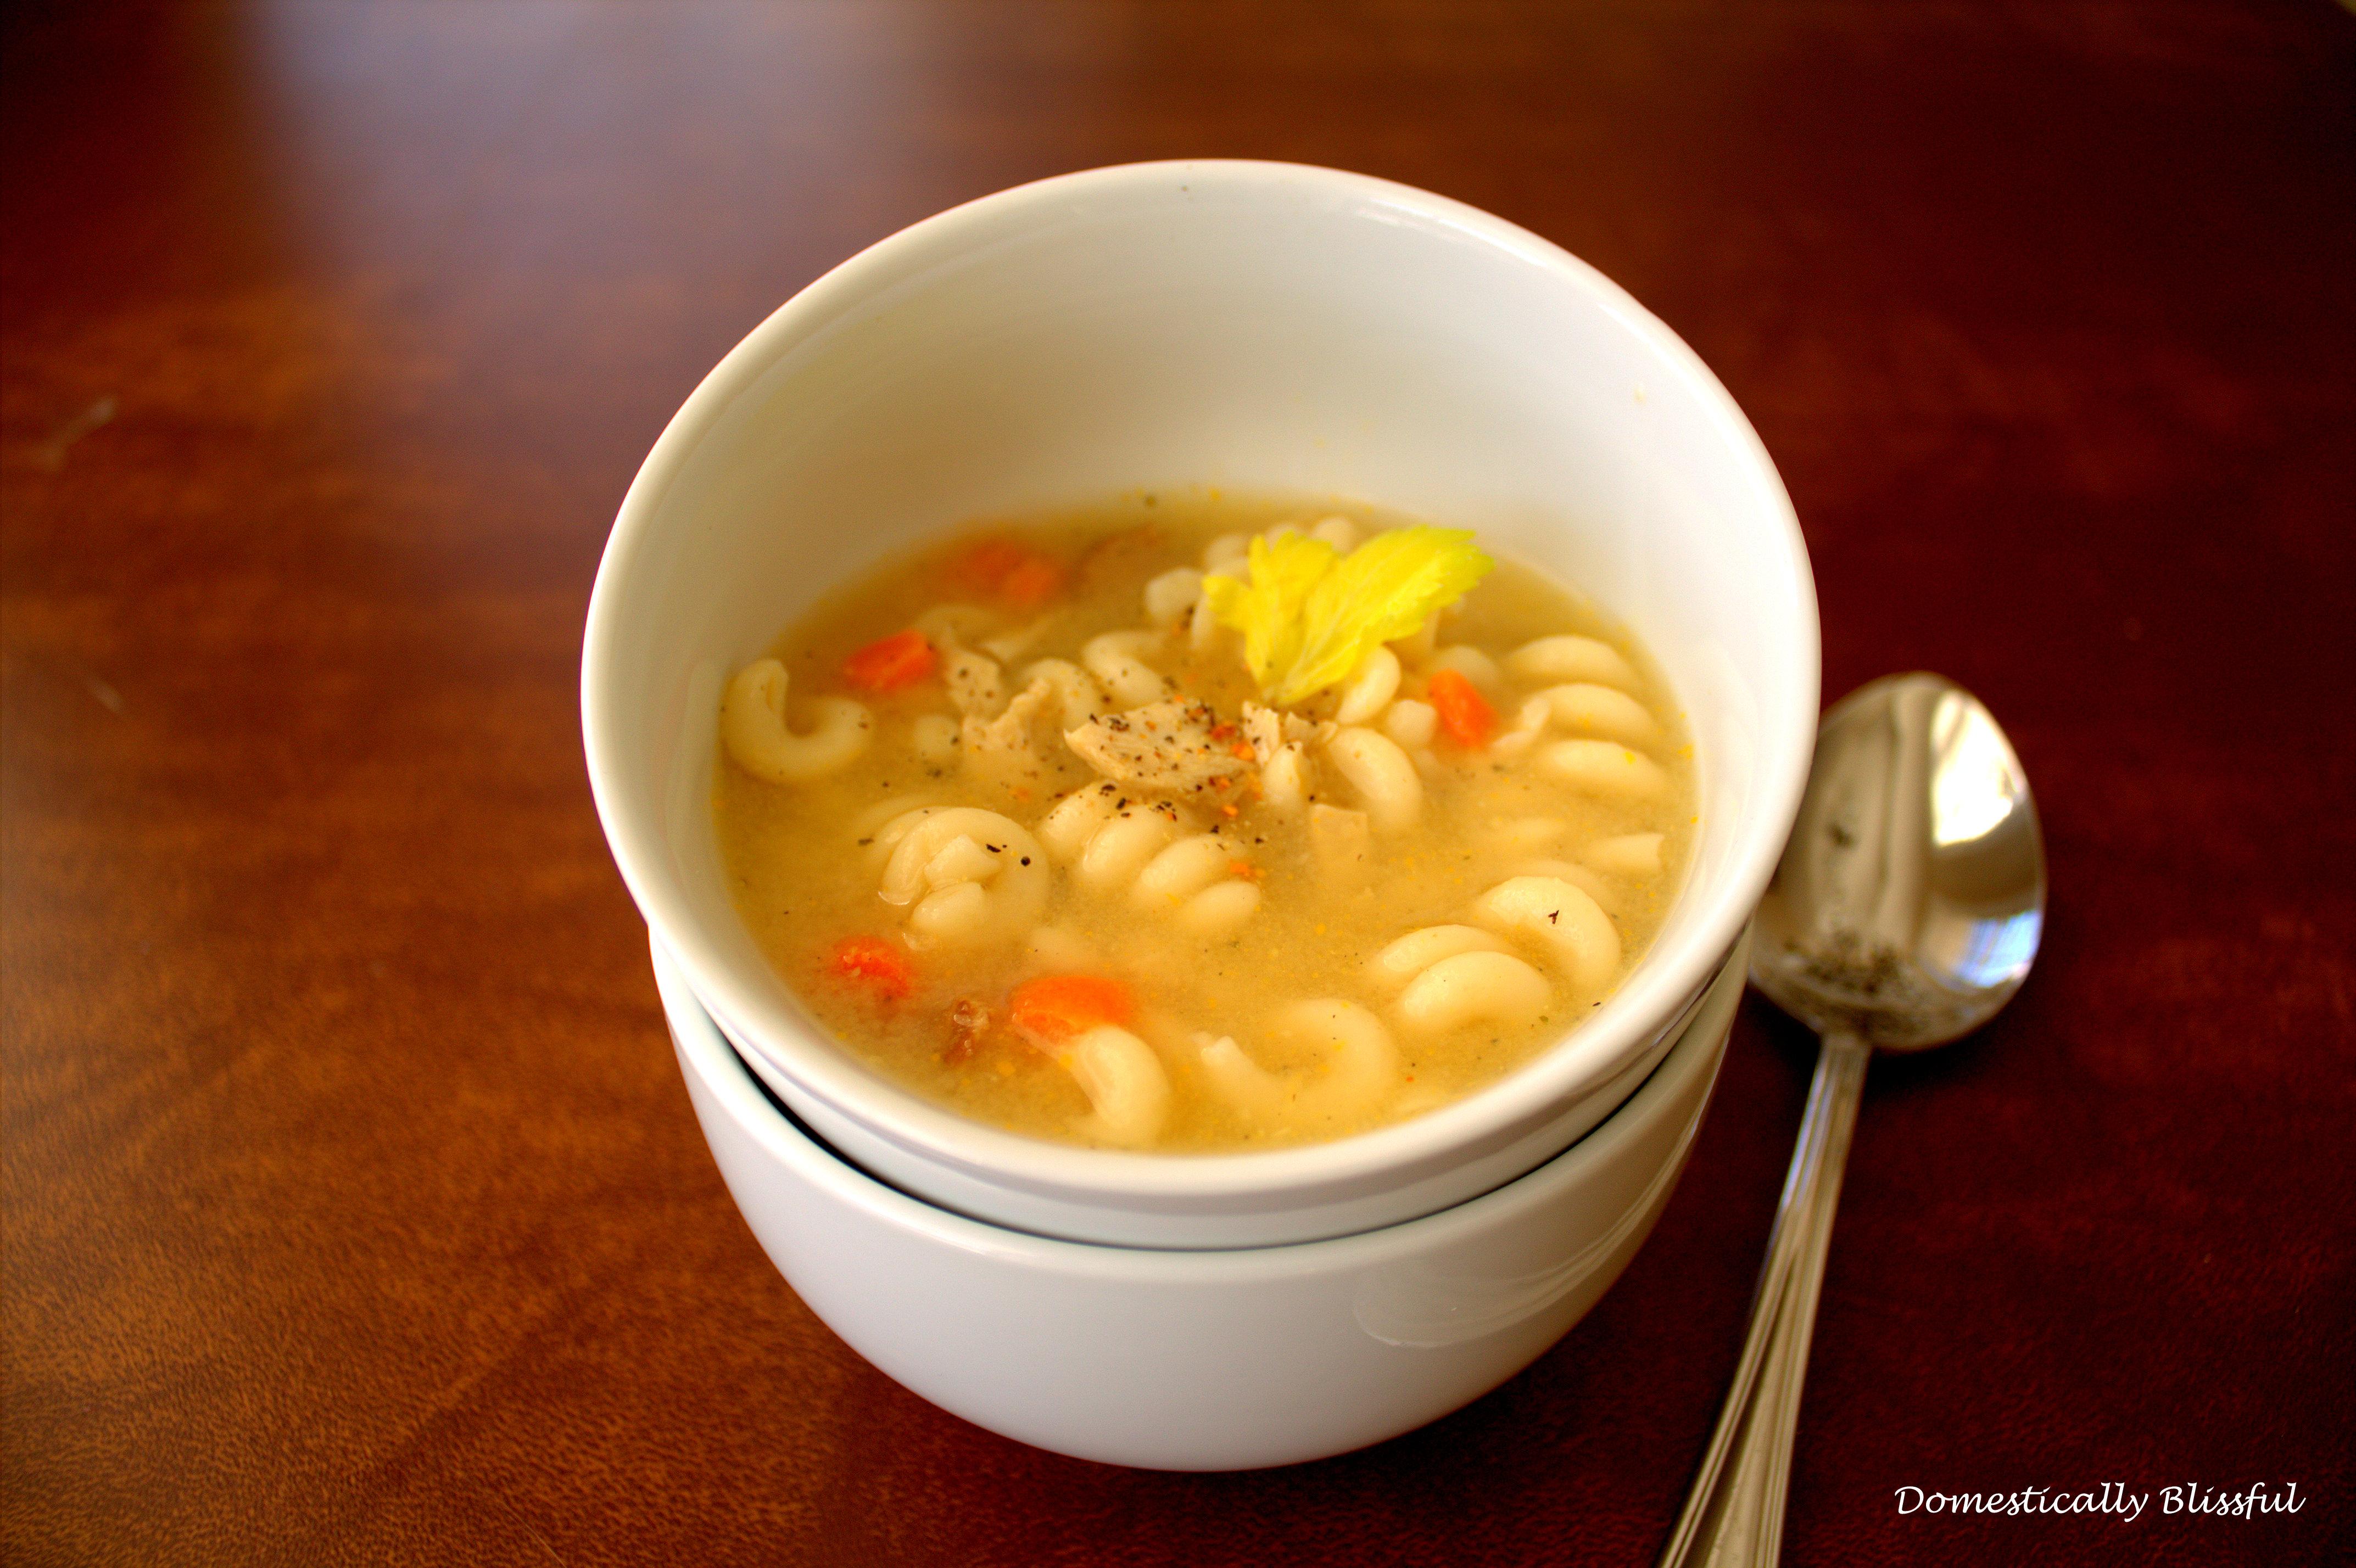 Chicken Noodle Soup for Vegetarians